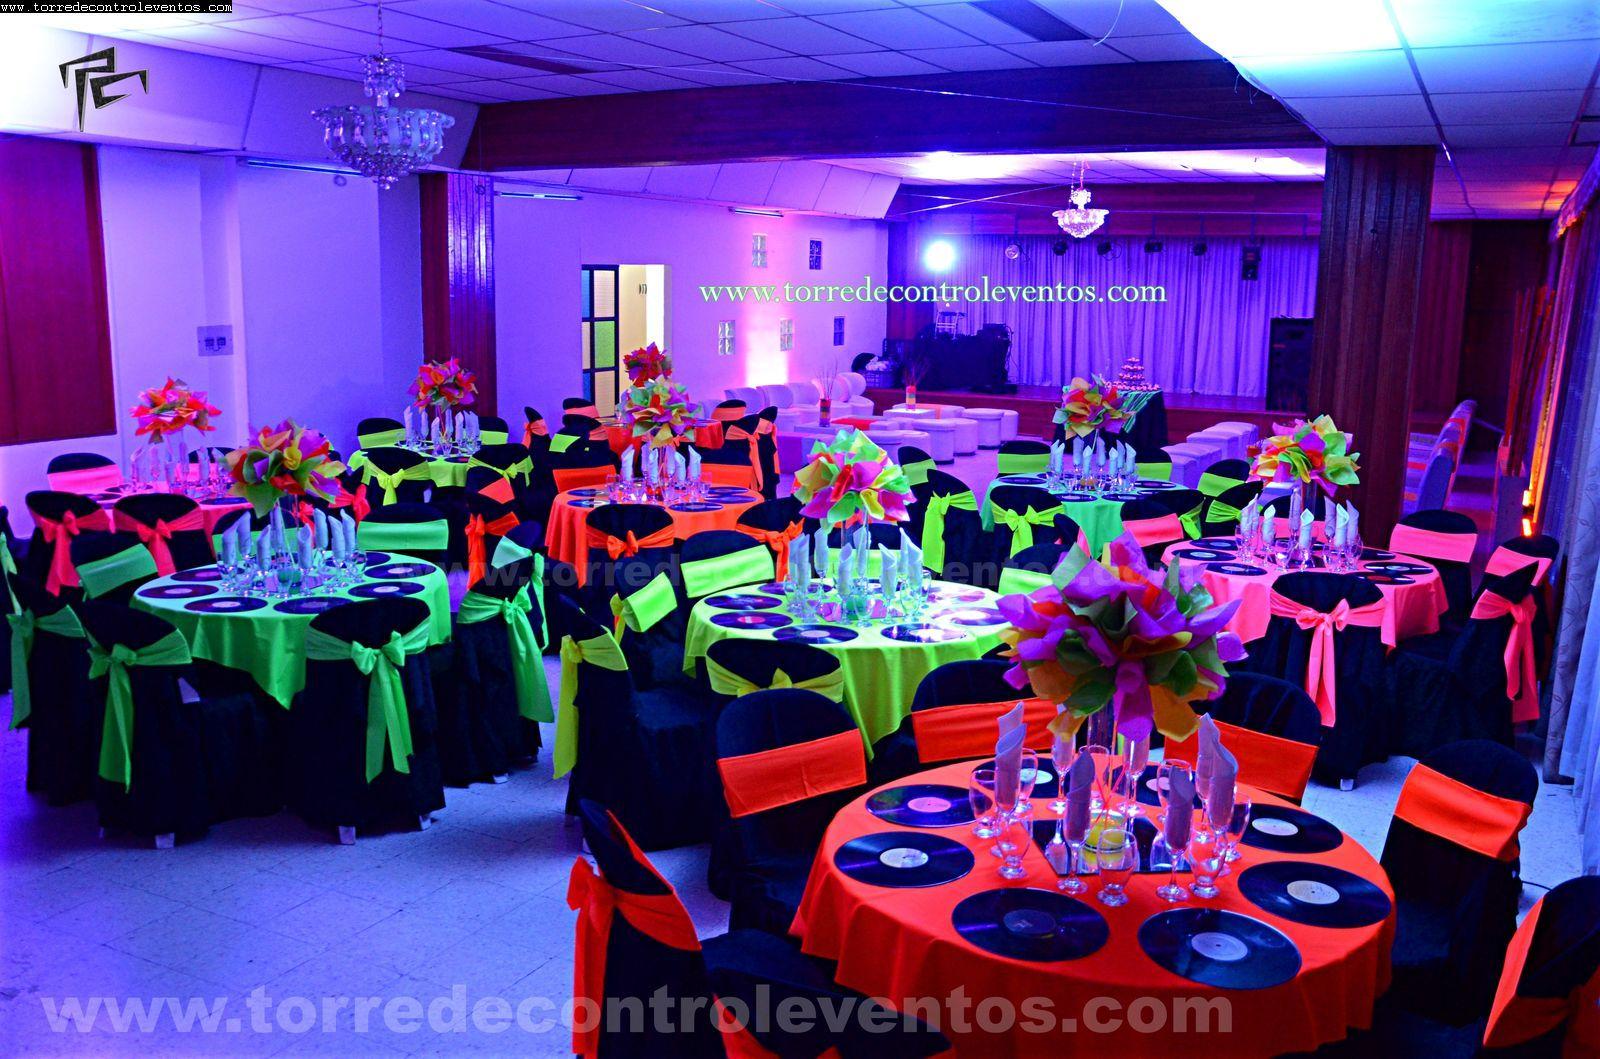 Fiesta tematica neon 15 a os fiesta ne n pinterest for Tematicas para 15 anos originales